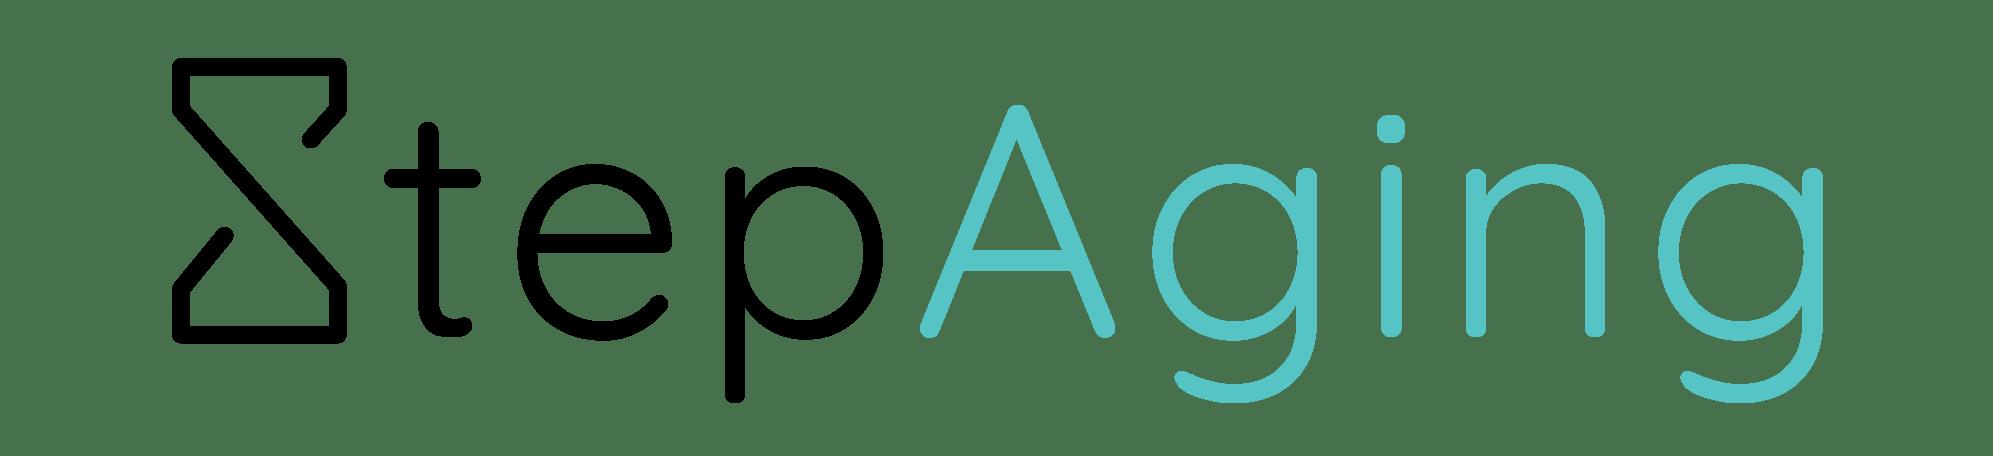 StepAging company logo